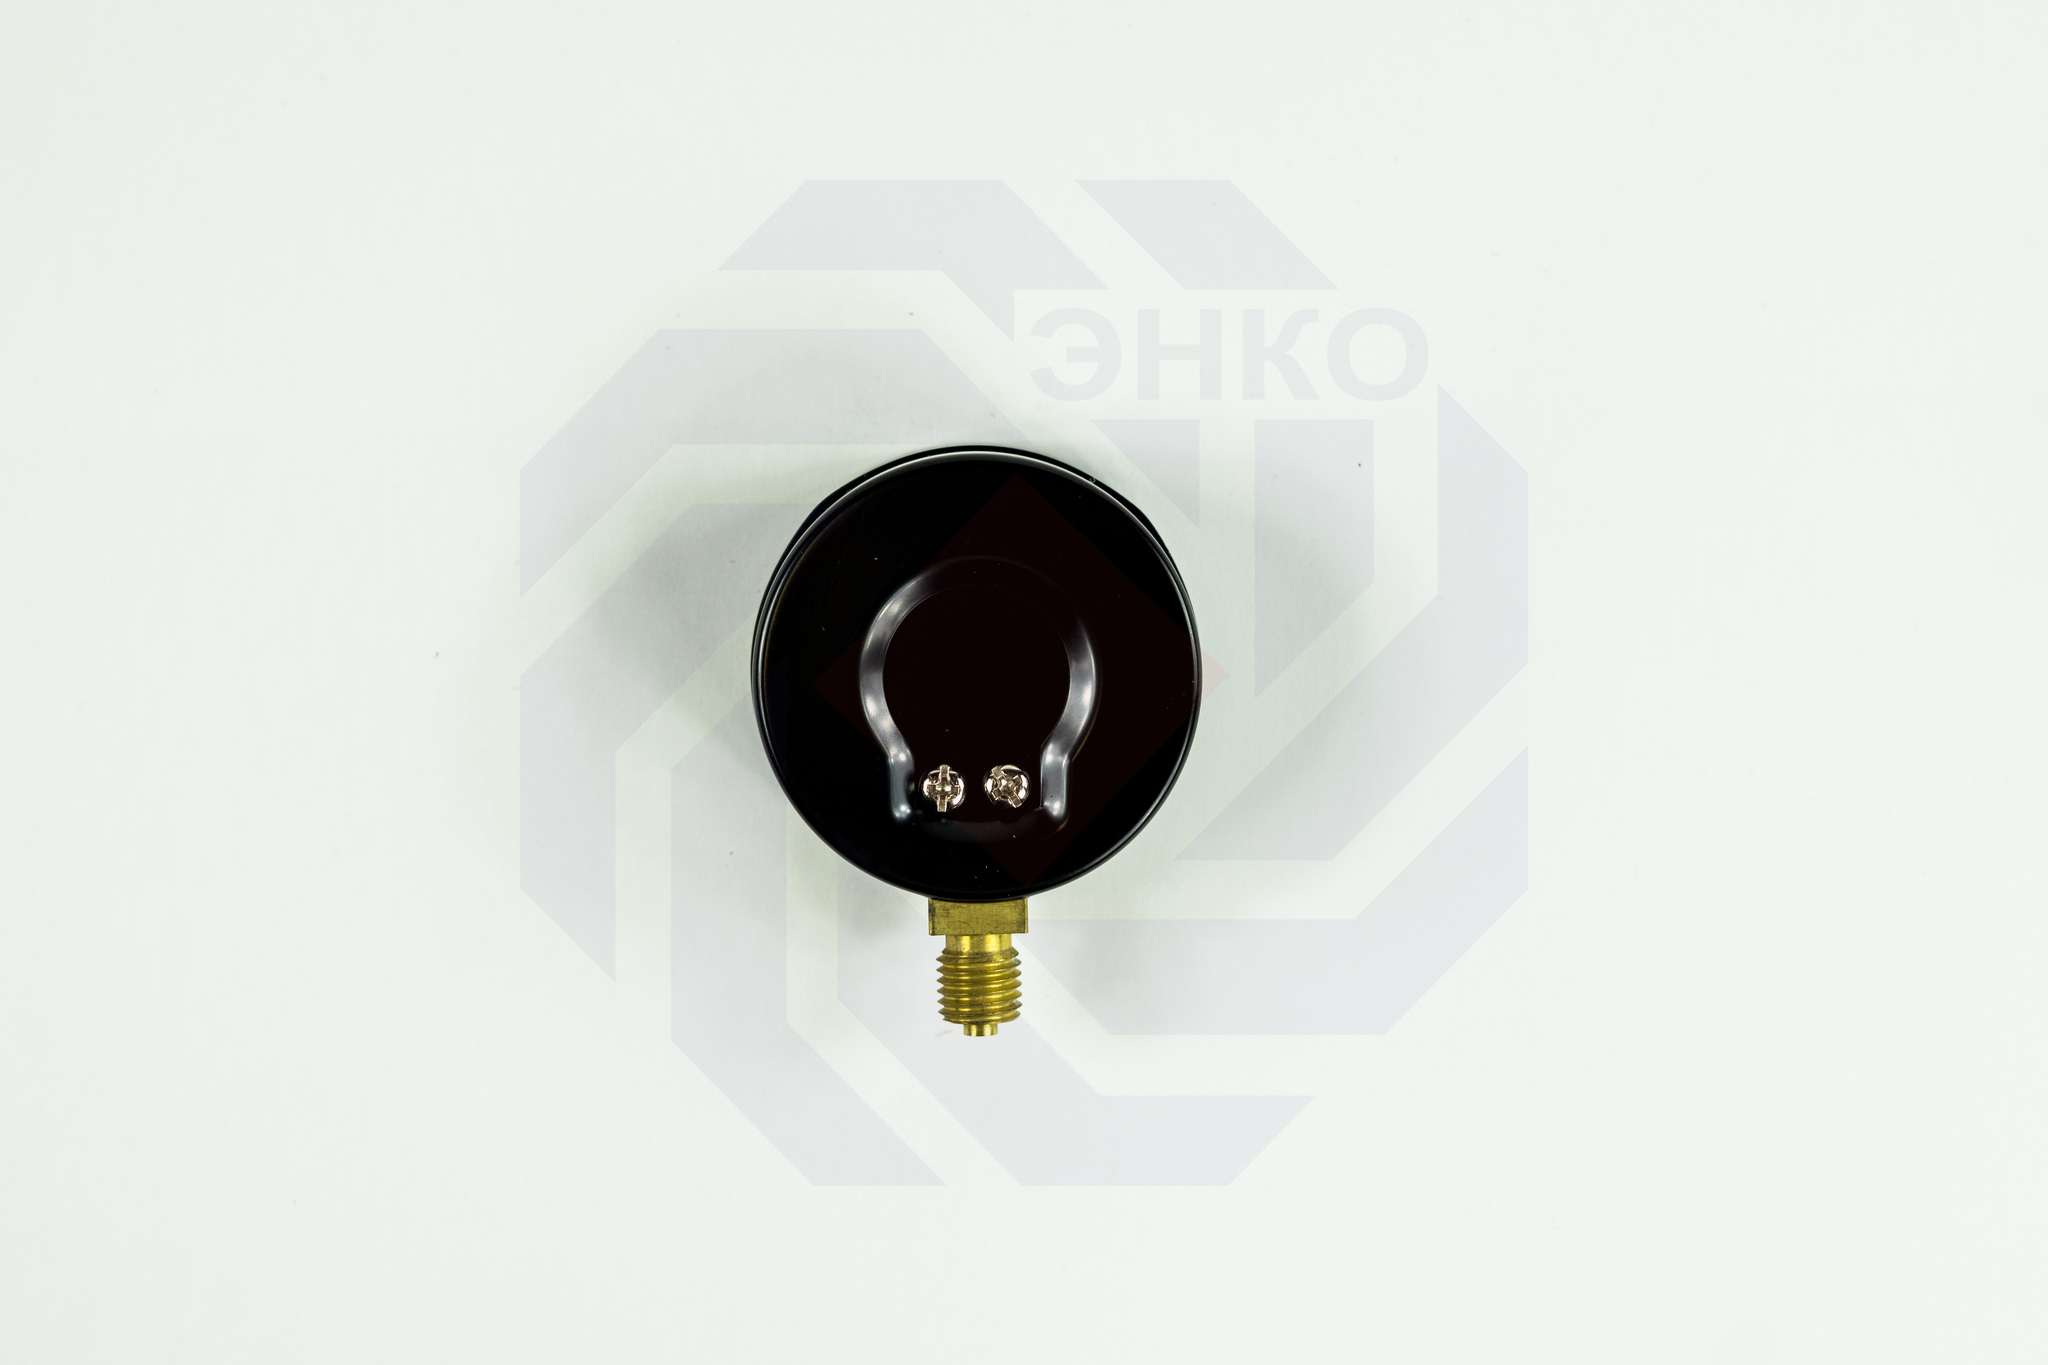 Манометр радиальный ЮМАС МП63М 0-1,0 МПа 63 мм M12⨯1,5